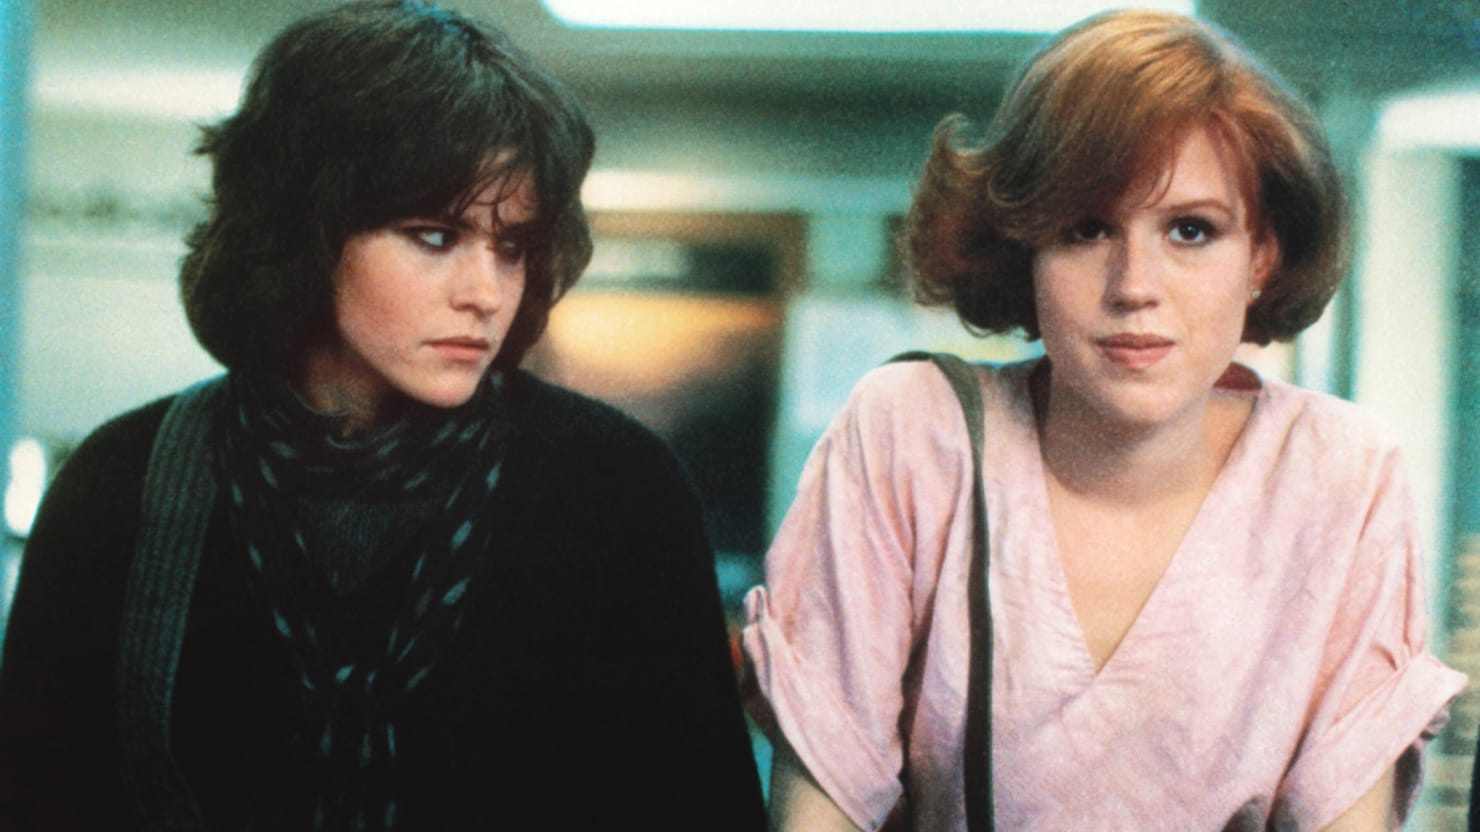 'The Breakfast Club' Turns 30: Molly Ringwald and Ally Sheedy Dish on the John Hughes Classic